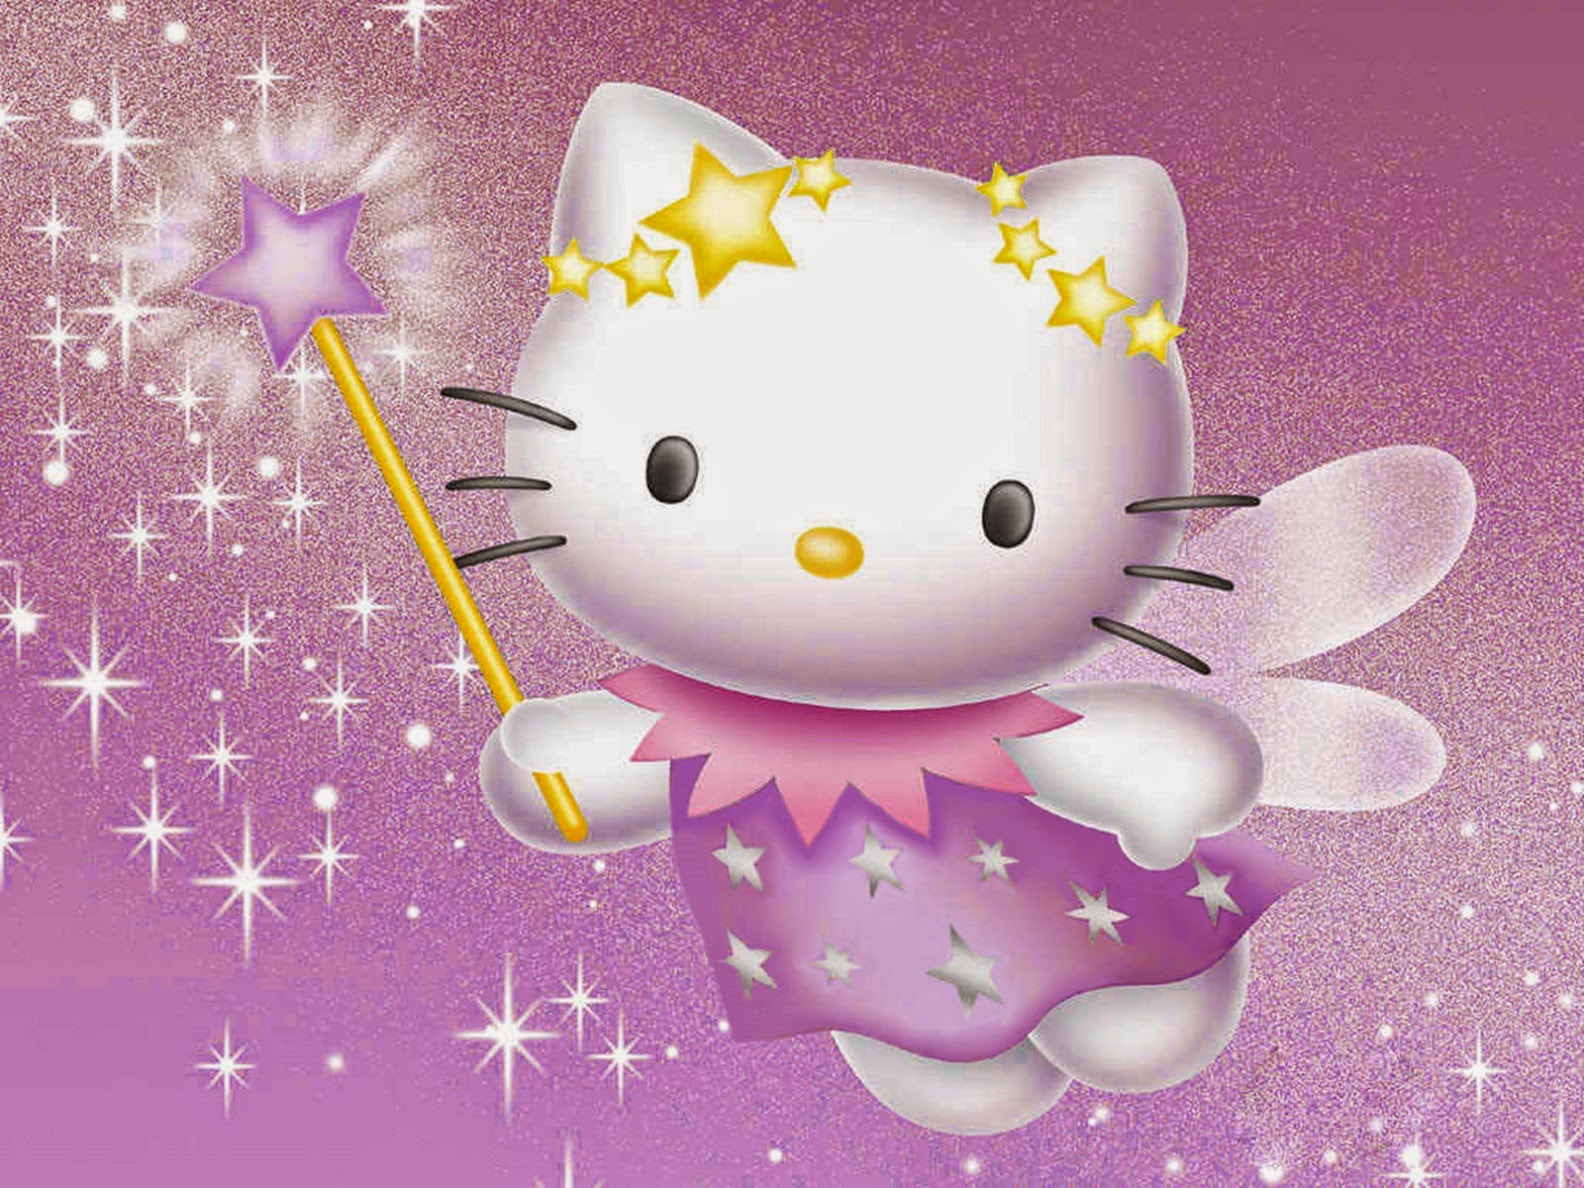 Fantastic Wallpaper Hello Kitty Sakura - 165532-Amazing%2BHello%2BKitty%2BHD%2BWallpaperz  Gallery_16398.jpg